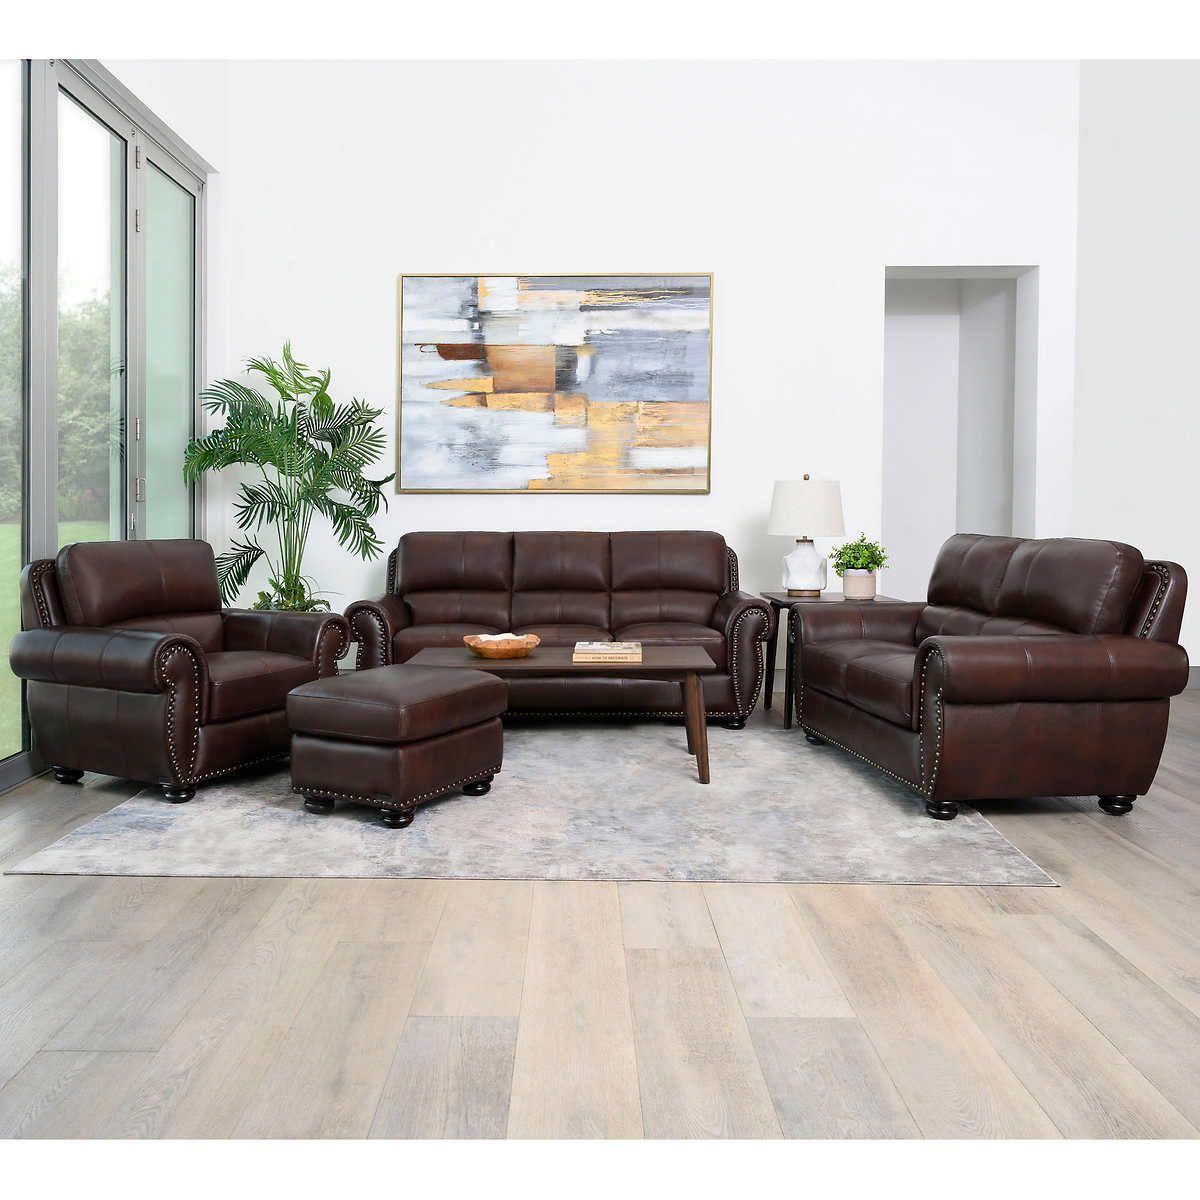 Austin 4 Piece Top Grain Leather Living Room Set In 2020 Living Room Leather Living Room Sets Leather Living Room Set